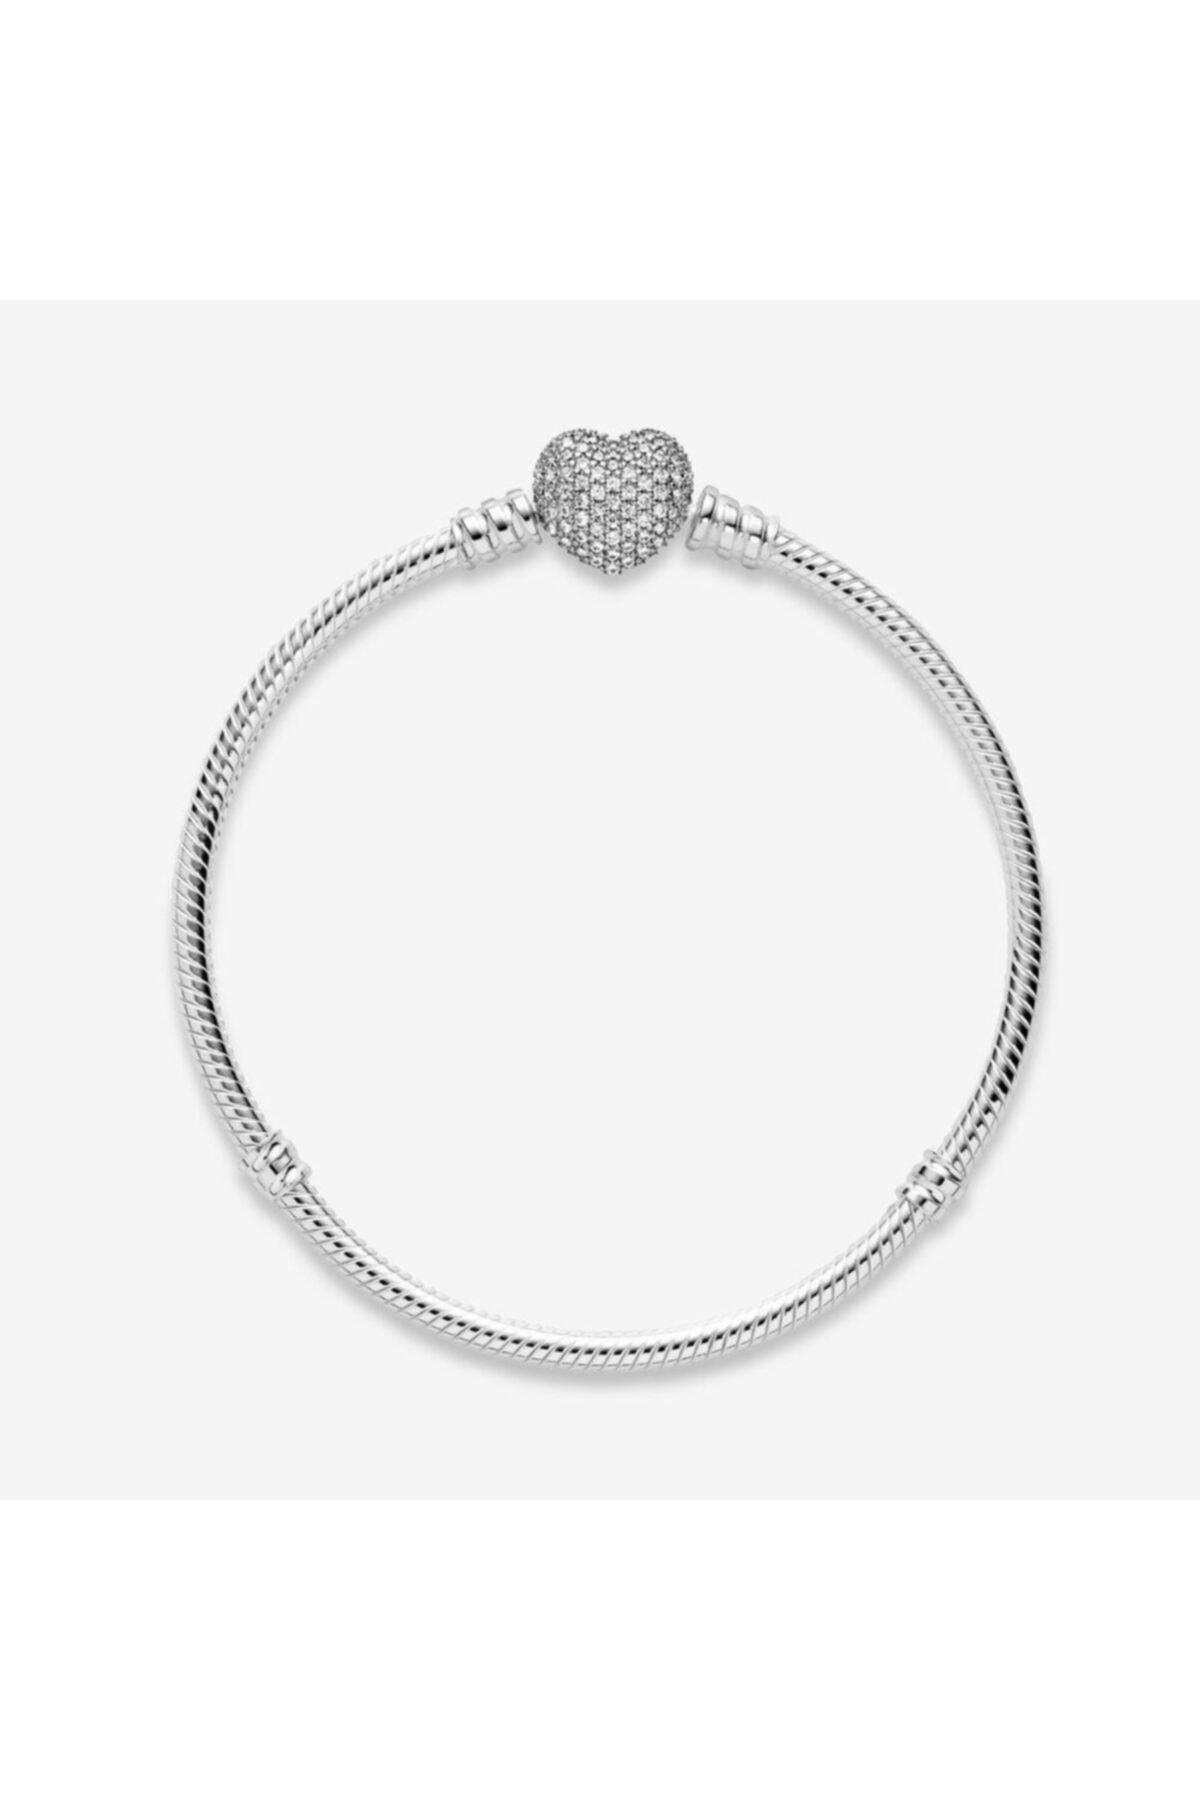 My Story Pandora Charm Uyumlu Pave Taşlı Kalp Gümüş Bileklik 2